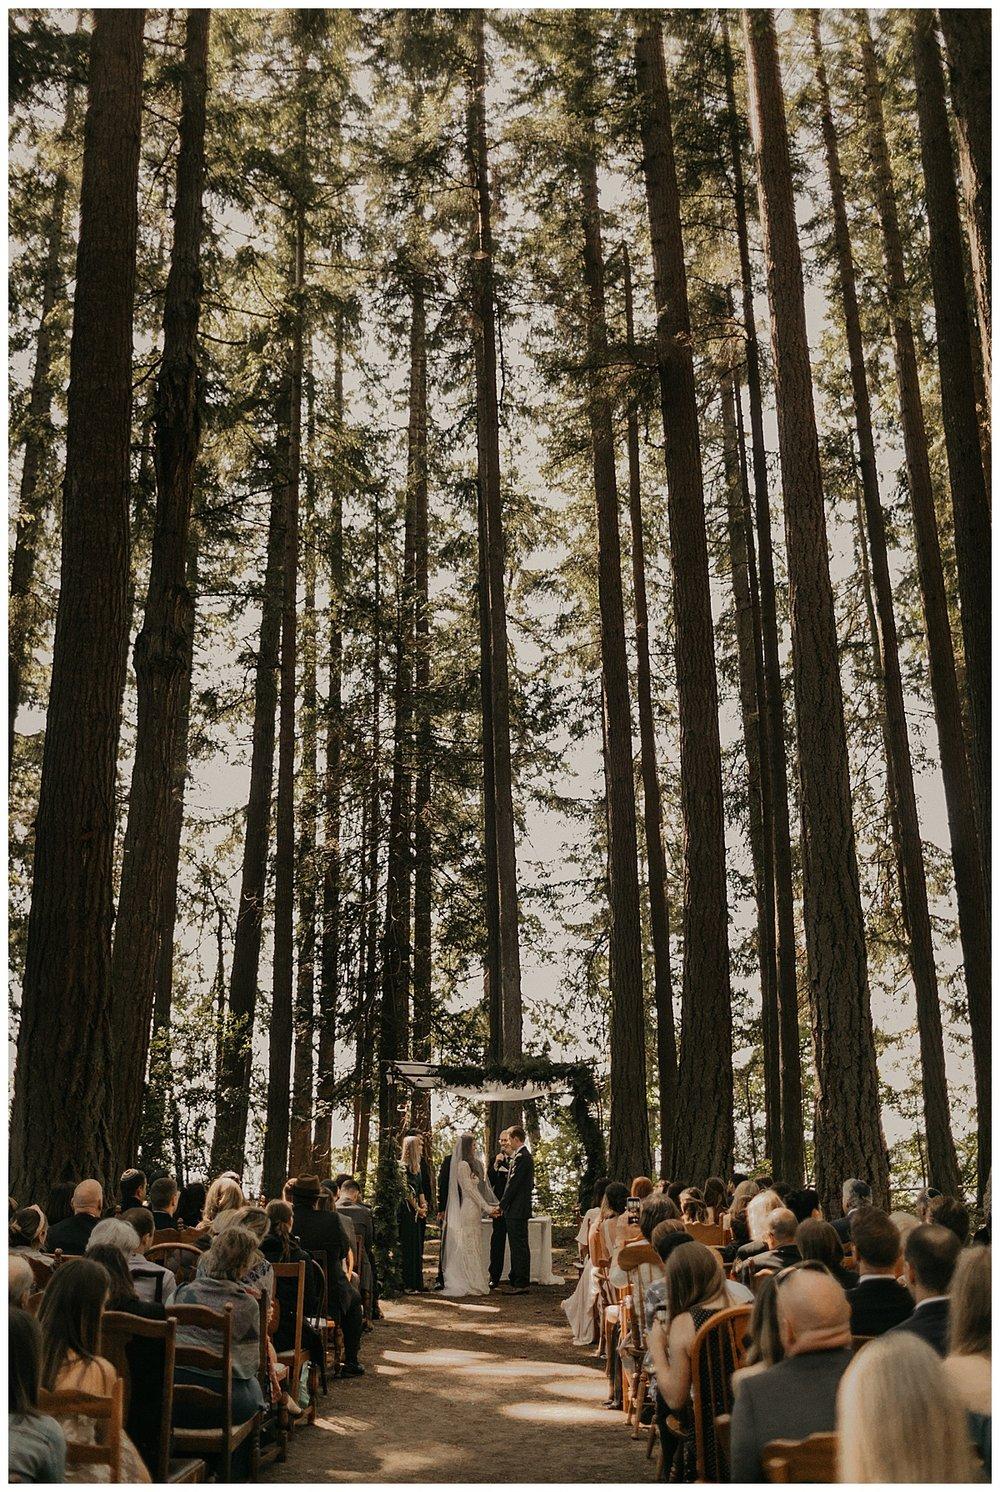 Bixby-+-Pine-Samantha-McFarlen-Kitsap-Memorial-State-Park-_0028.jpg